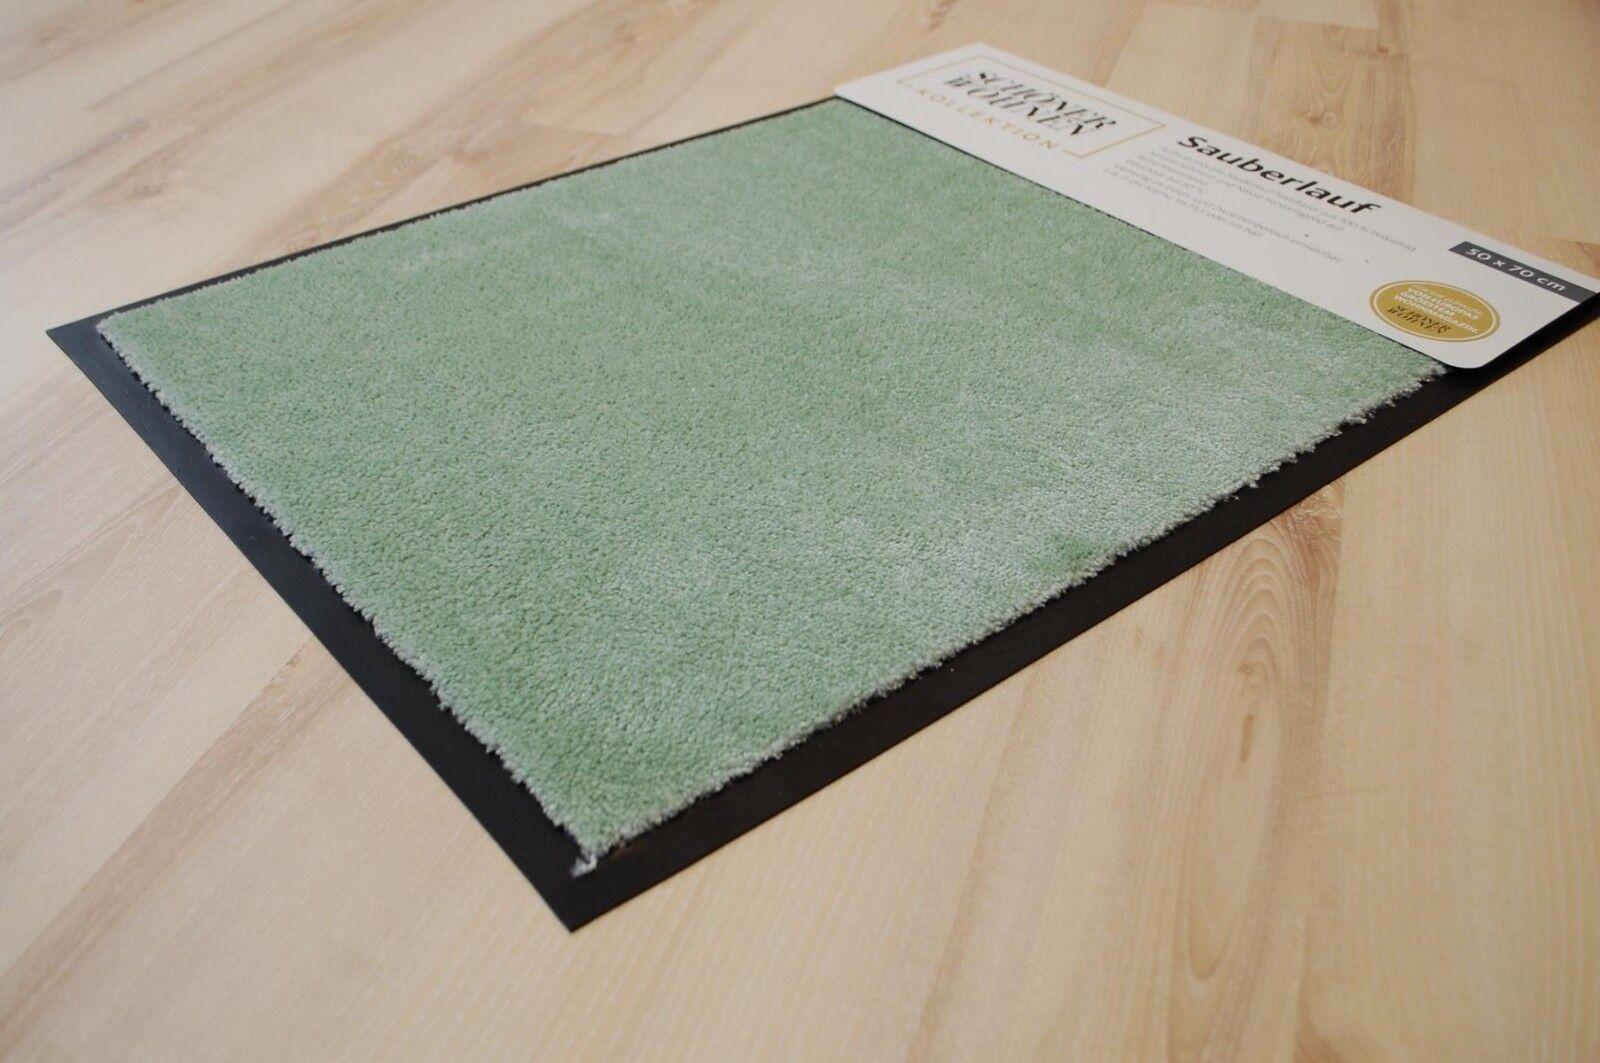 Tappetino bel vivere Miami 1688 UNI 037 MINT 67x100 cm türmatte verde